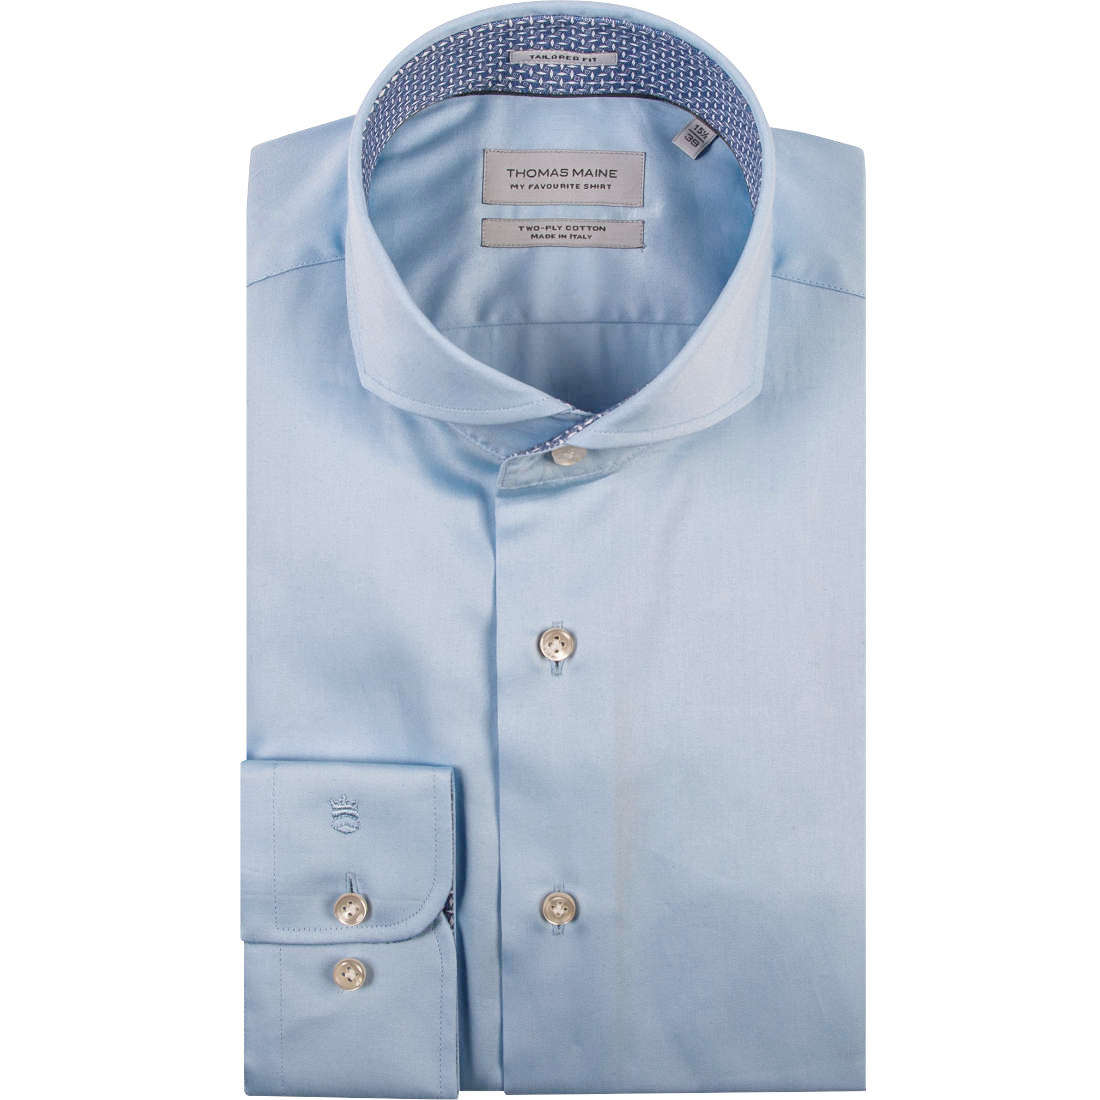 Thomas Maine overhemd Tailored Fit 91-7700a in het Licht Blauw